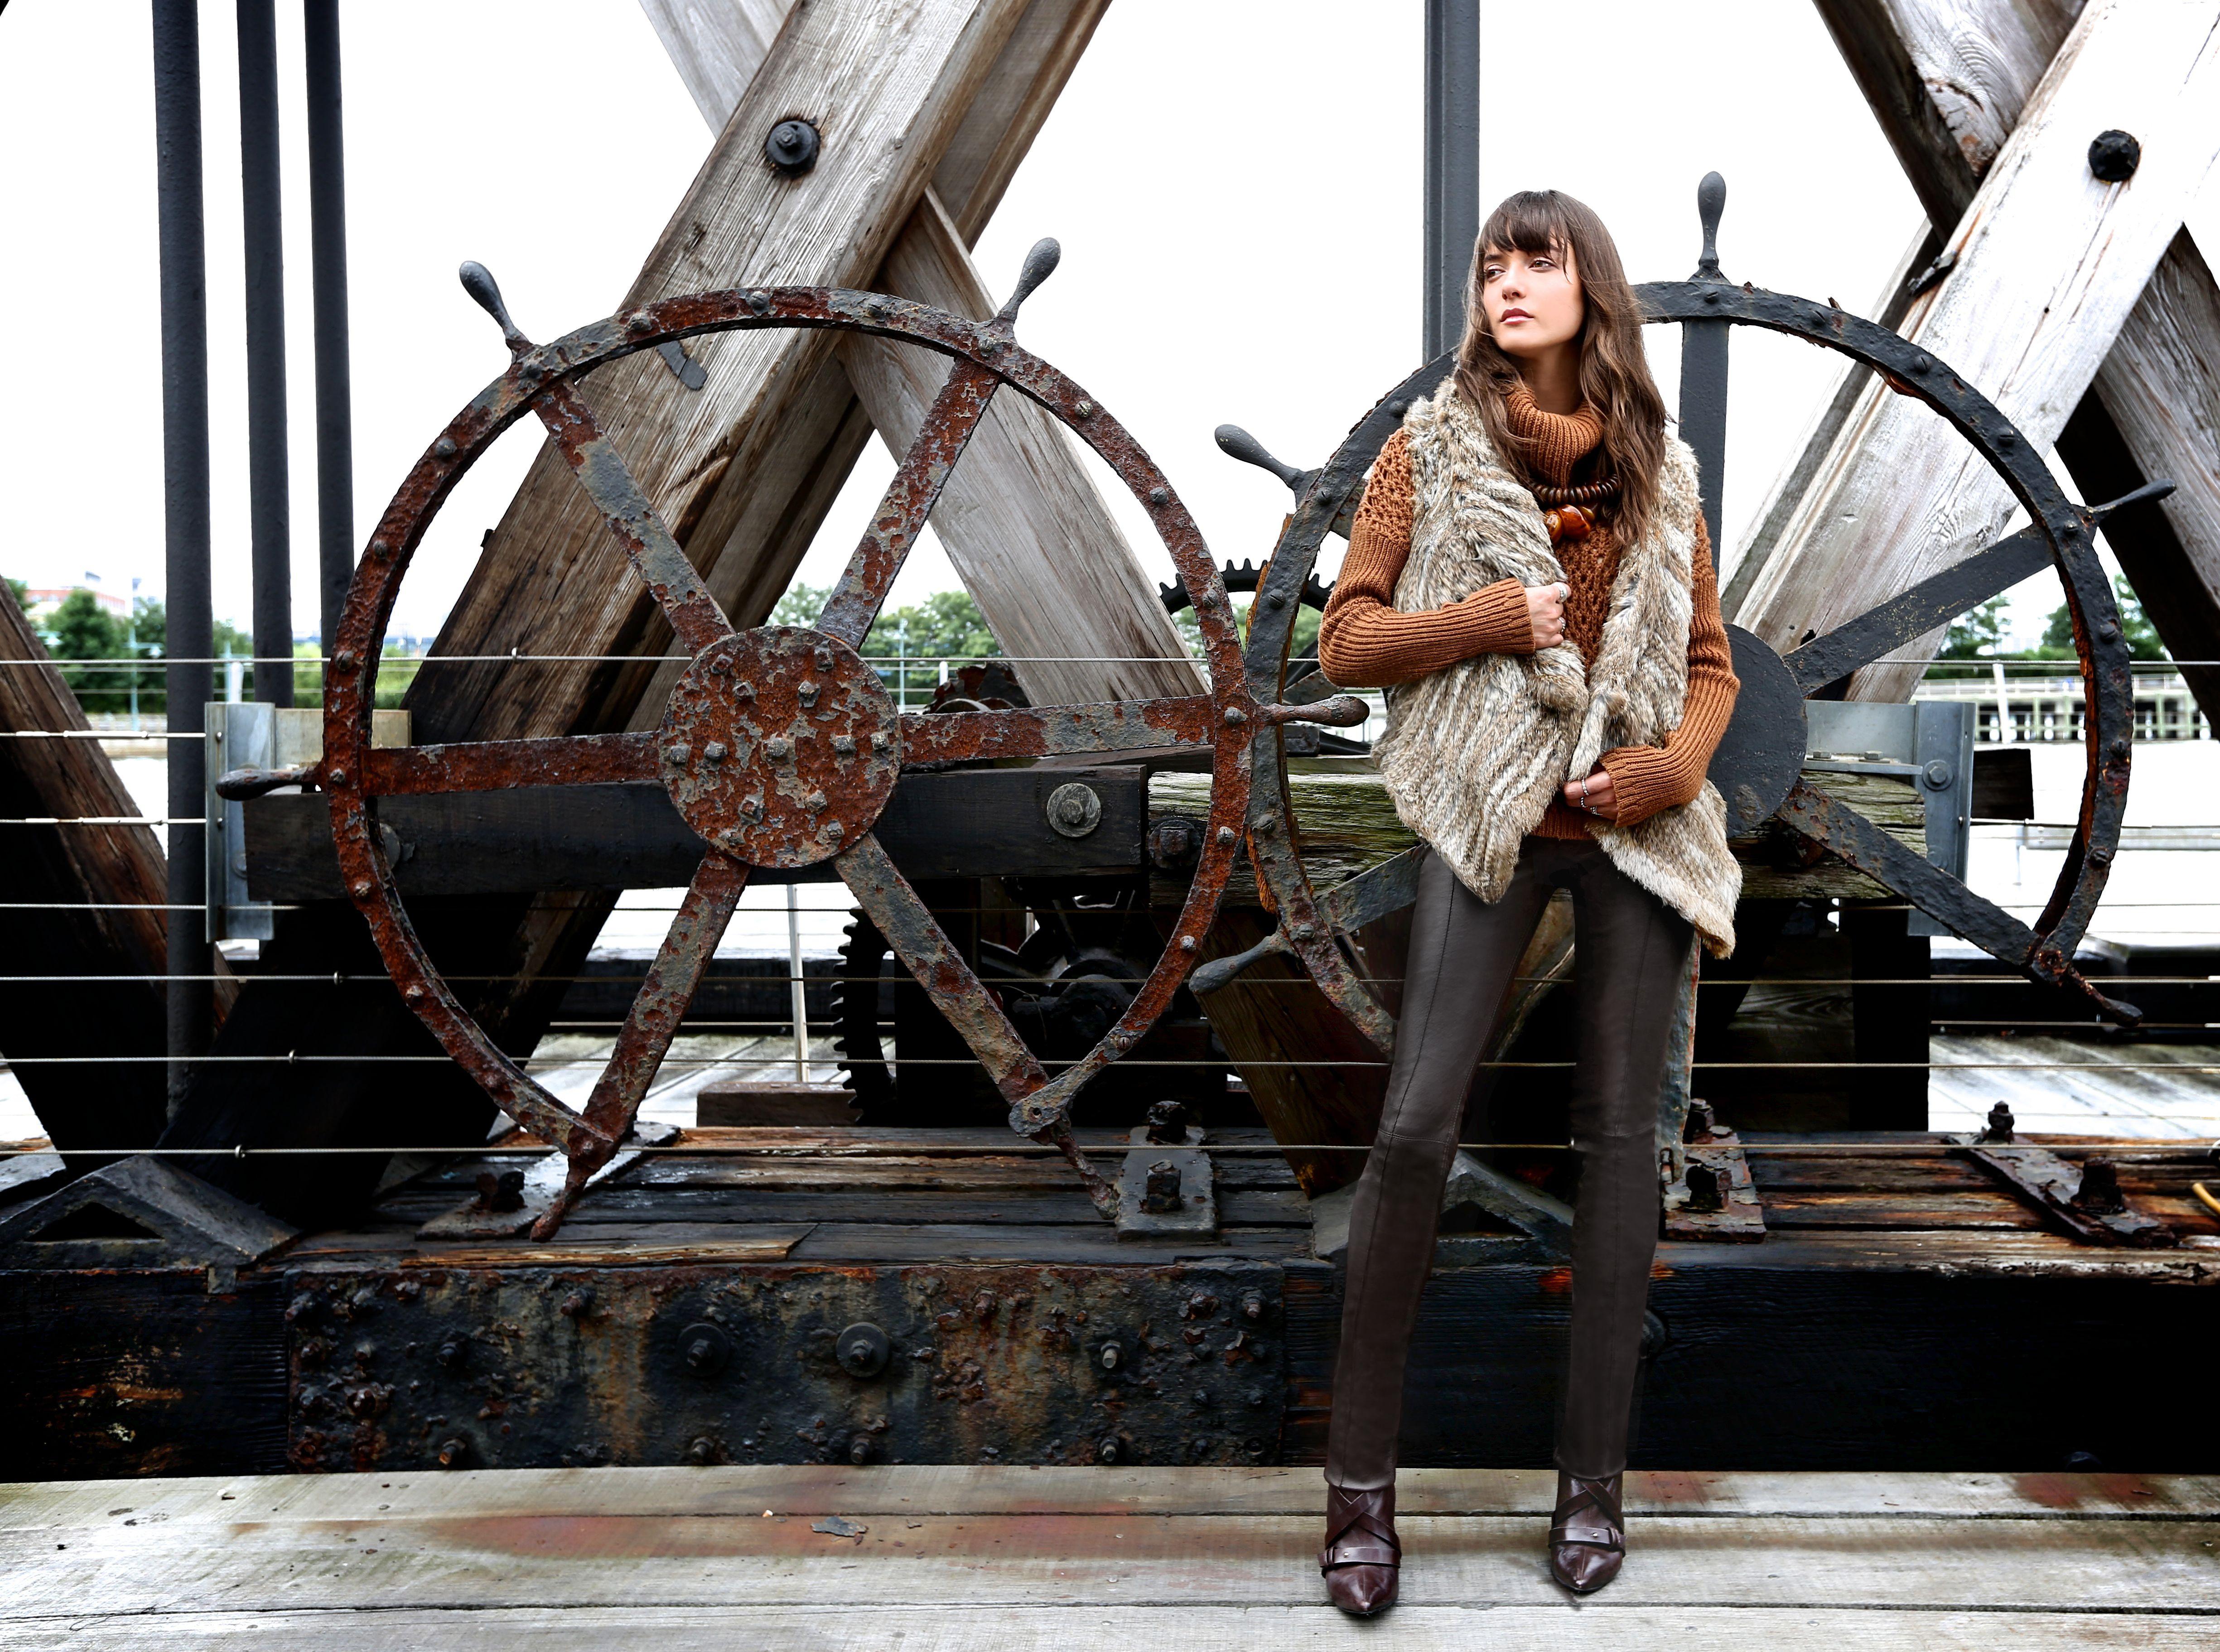 More Knitting Wheel Fashions : We love a cozy fur knit! o girls pinterest models posts